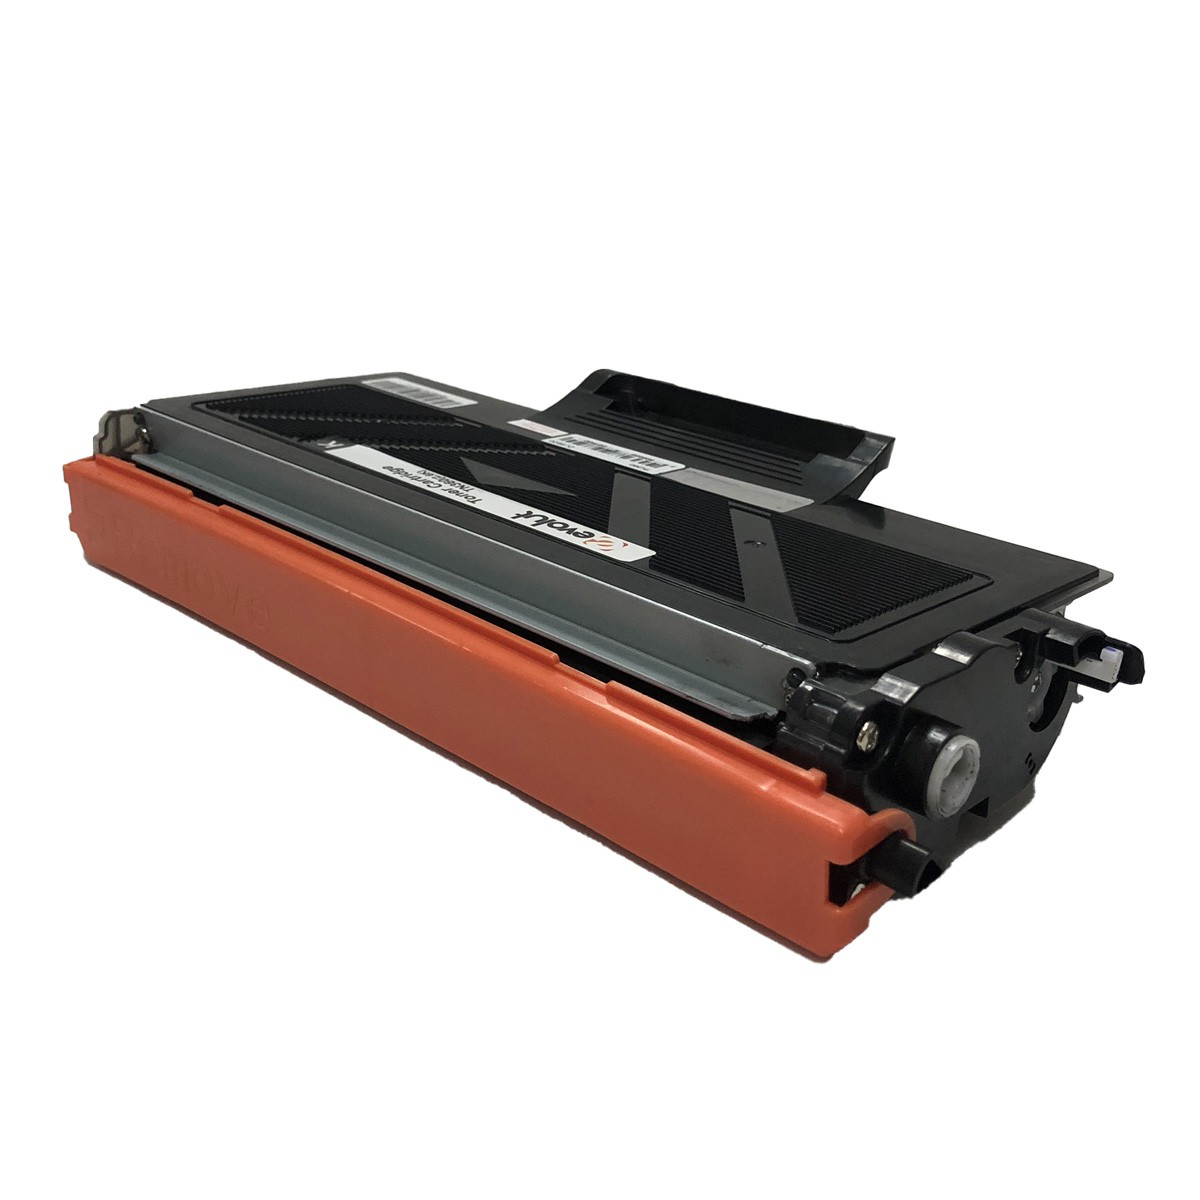 Toner TN360 Chinamate Compatível com HL2140 2150N 2170N 2170W DCP7030 7040 MFC7045 7320 7340 7450 7440 7440N 7840W